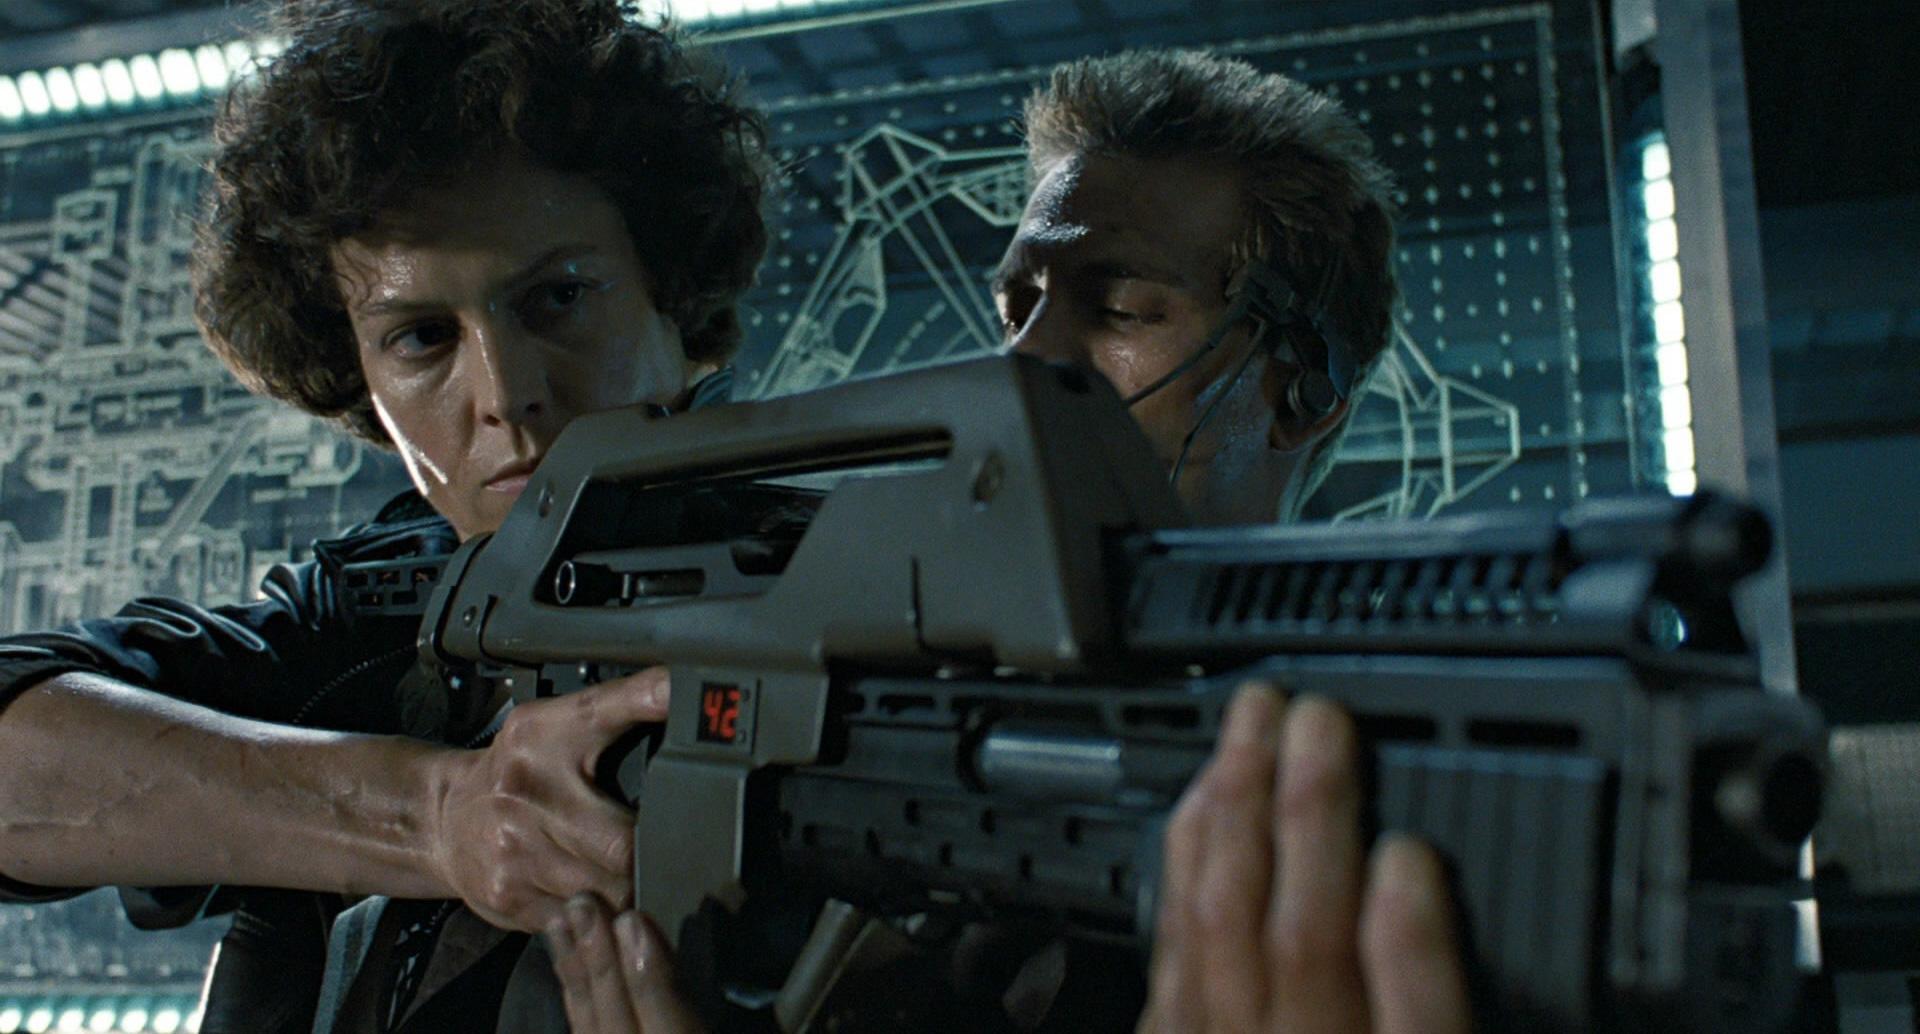 http://vignette2.wikia.nocookie.net/avp/images/5/58/Aliens-m41a-pulse-rifle-12.jpg/revision/latest?cb=20130525170447